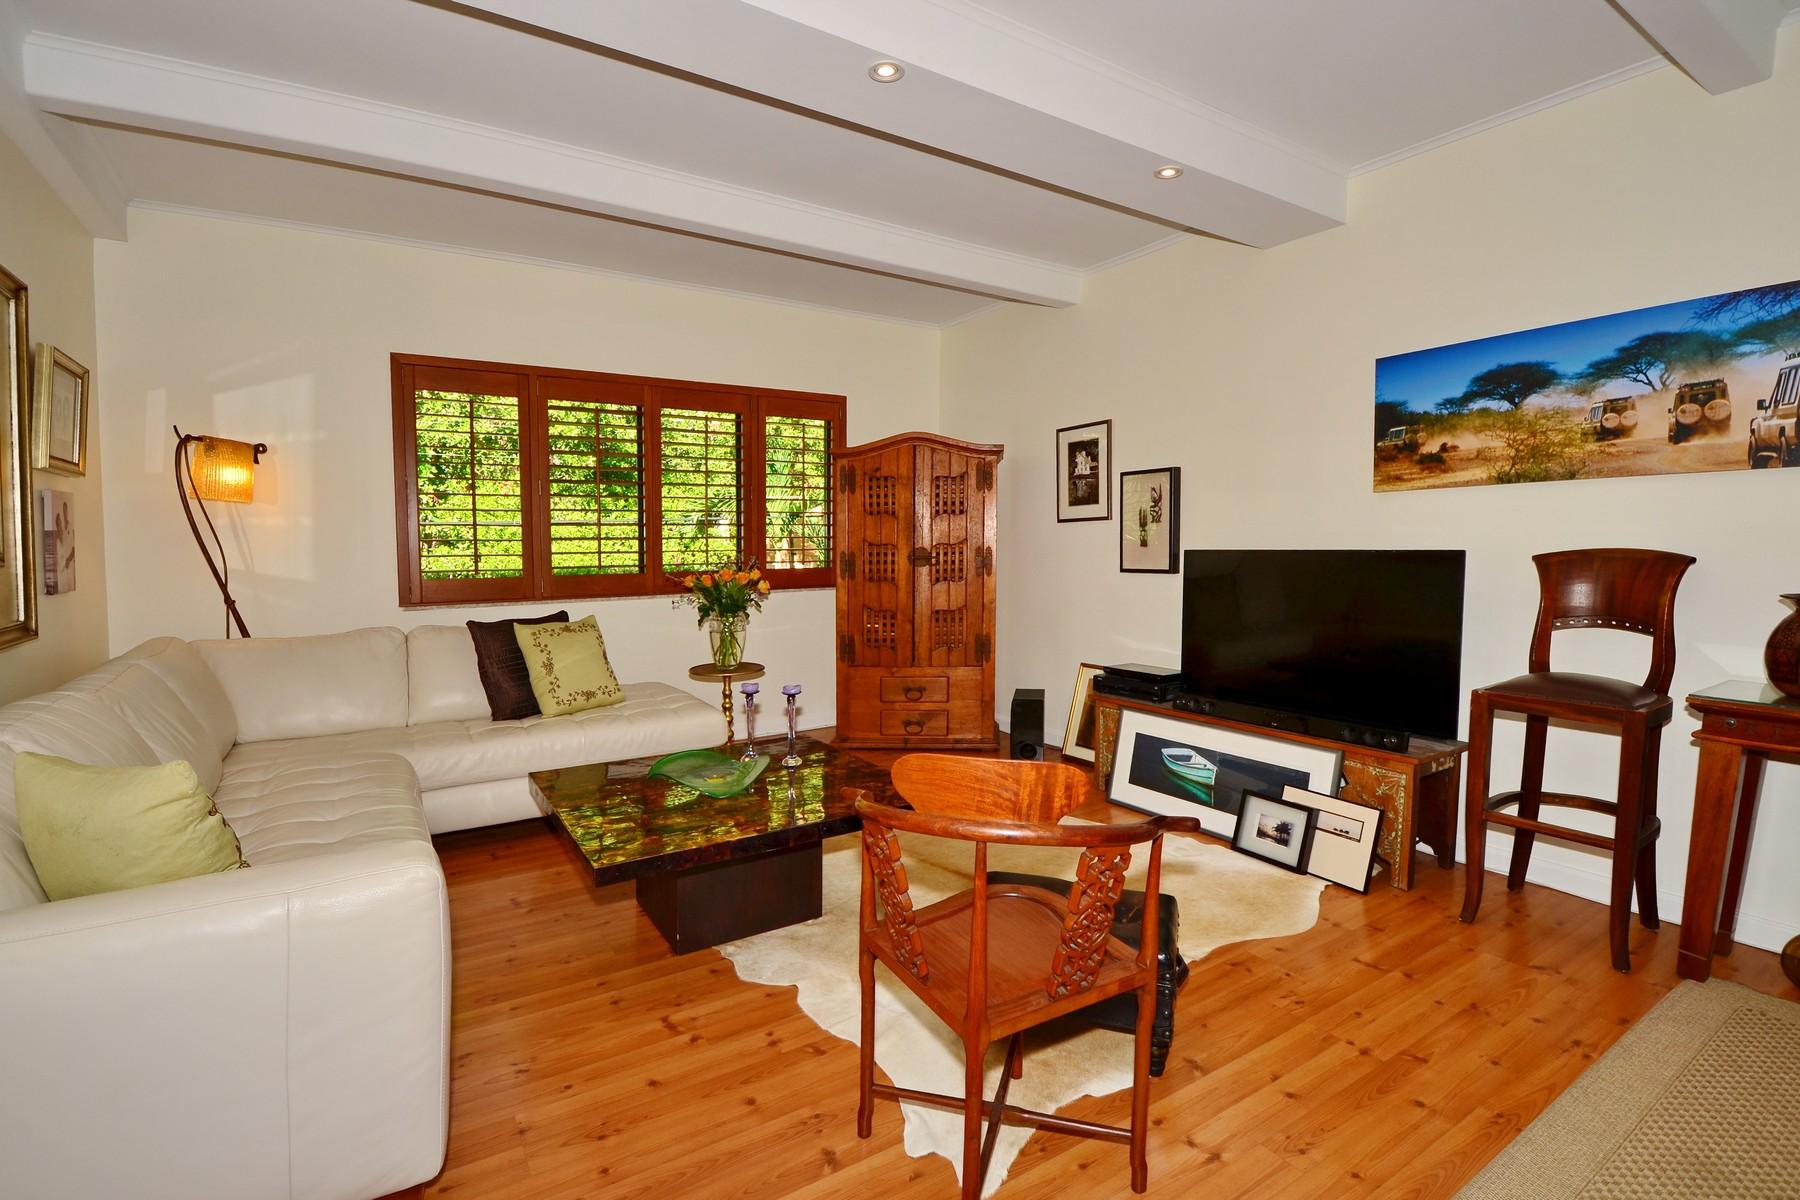 sales property at 250 S Ocean Blvd , 258, Delray Beach, FL 33483